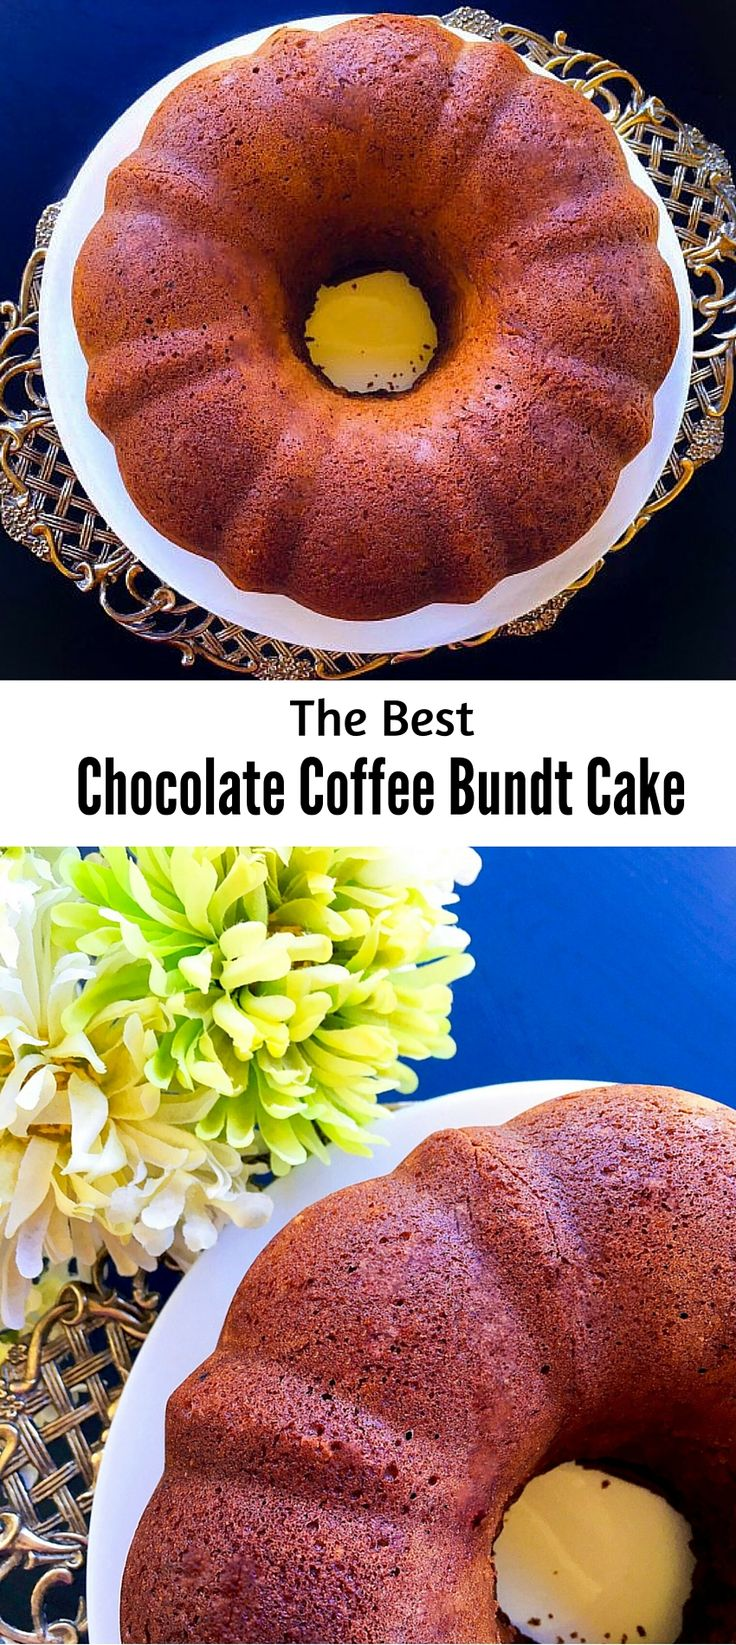 The Best Chocolate Coffee Bundt Cake : #bundt #chocolate #coffee #cake #recipe